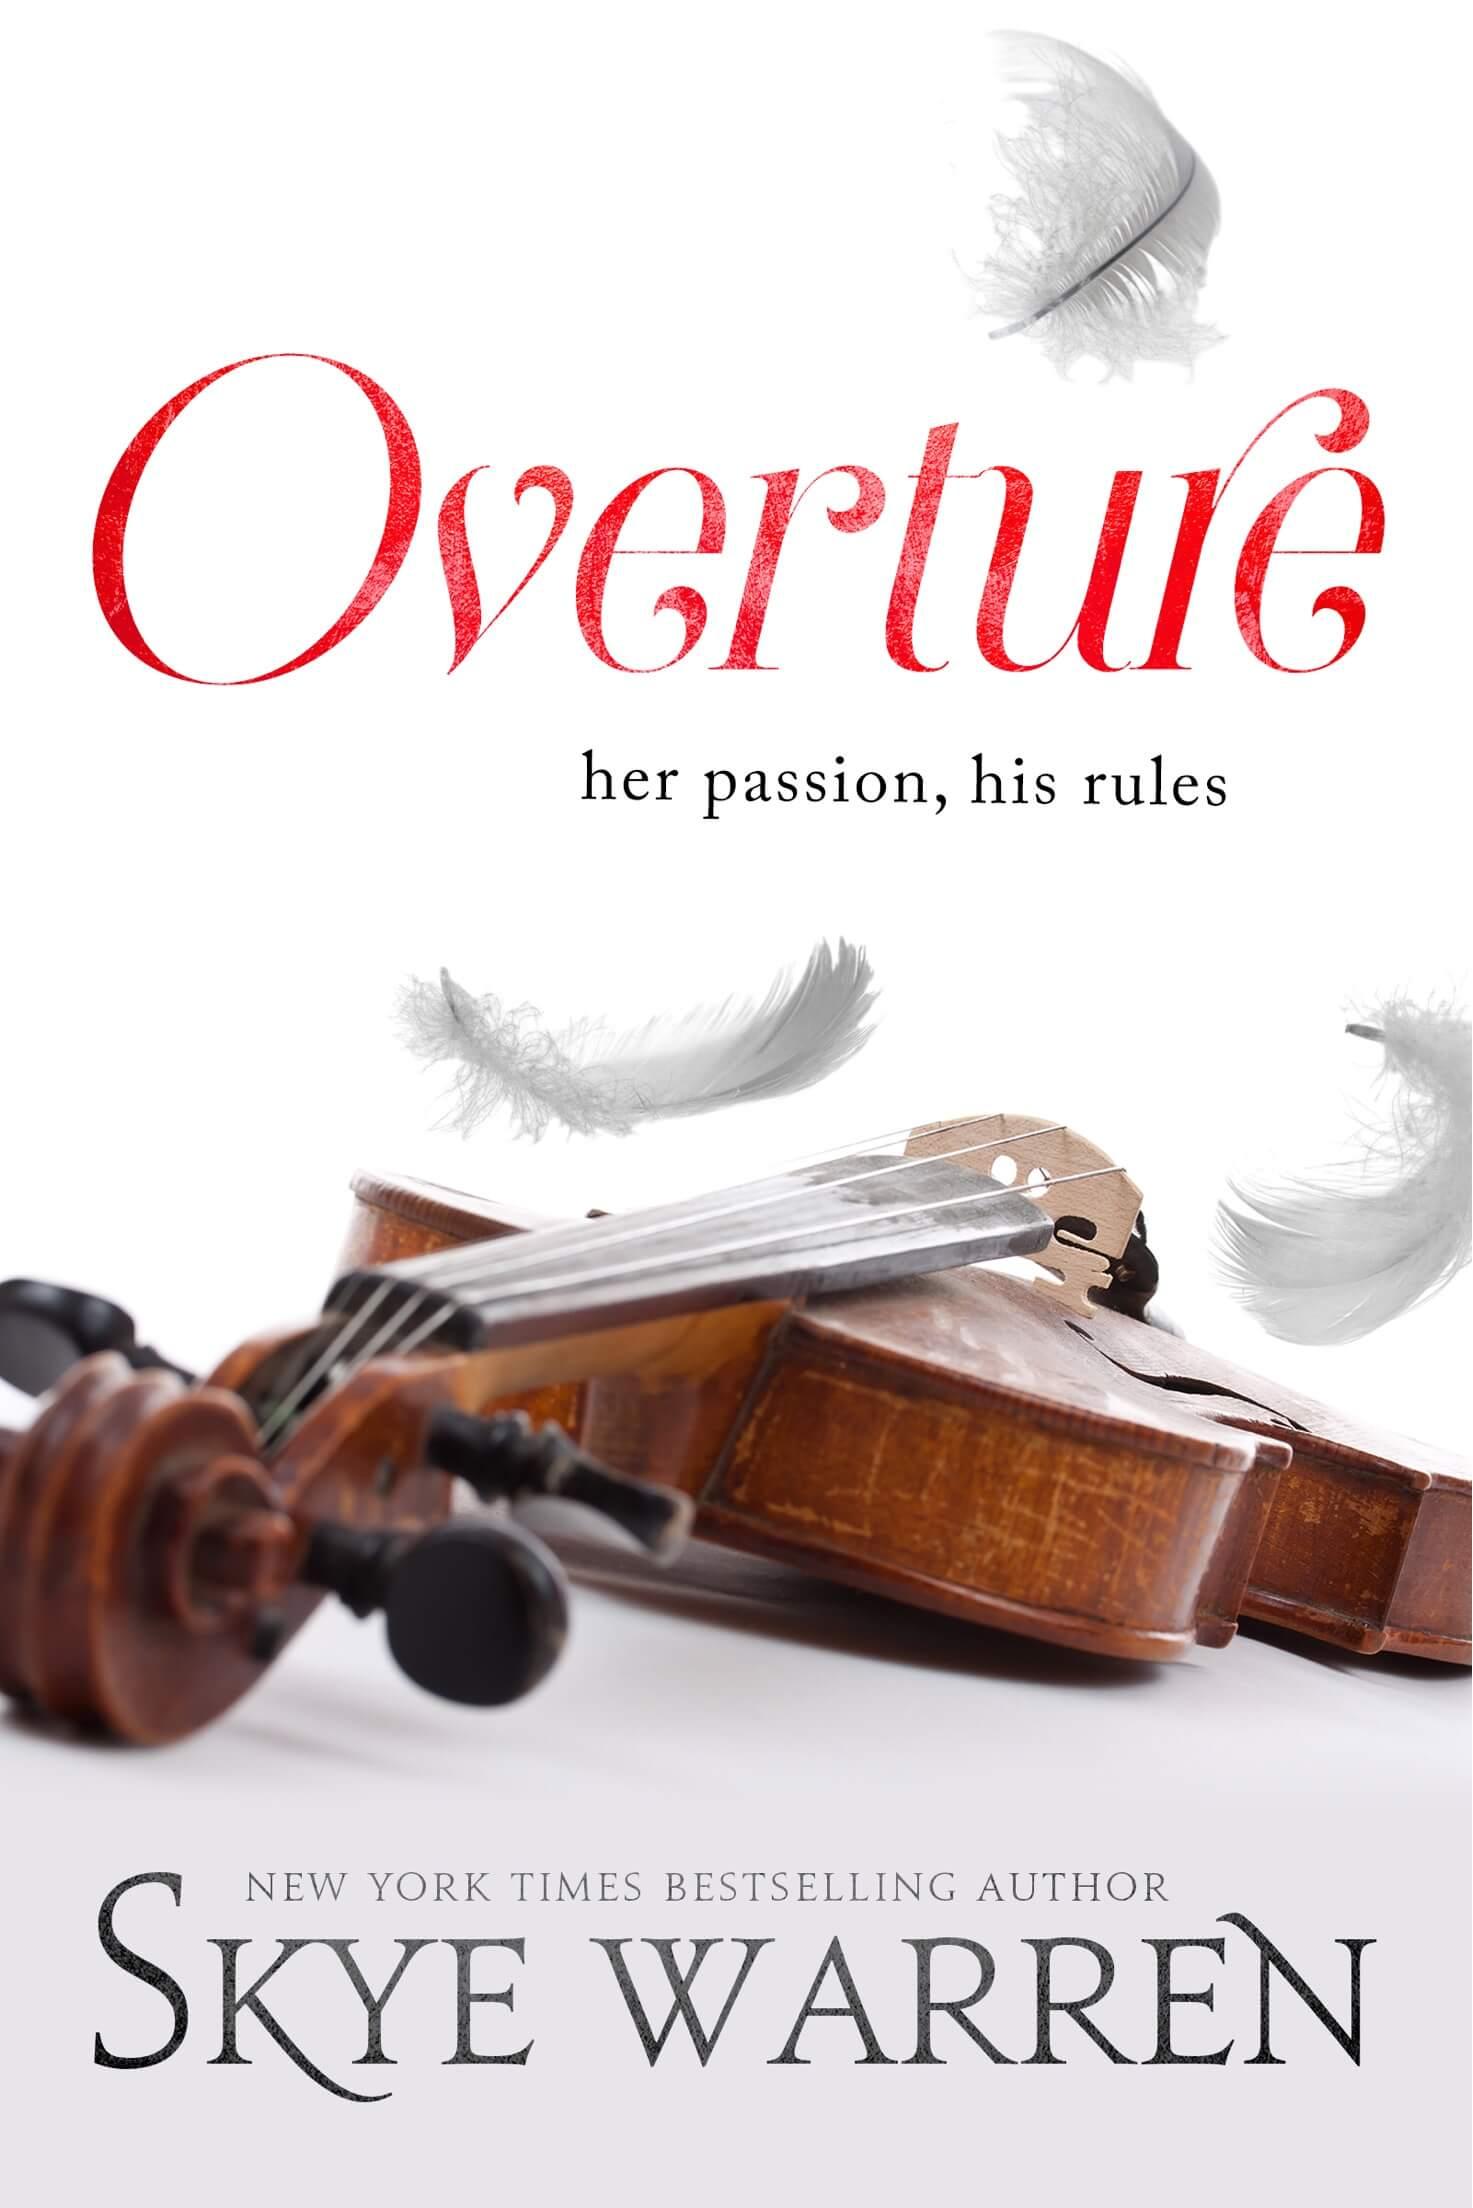 Blog Tour * Overture (North Security book 1) by Skye Warren * Excerpt * Book Review